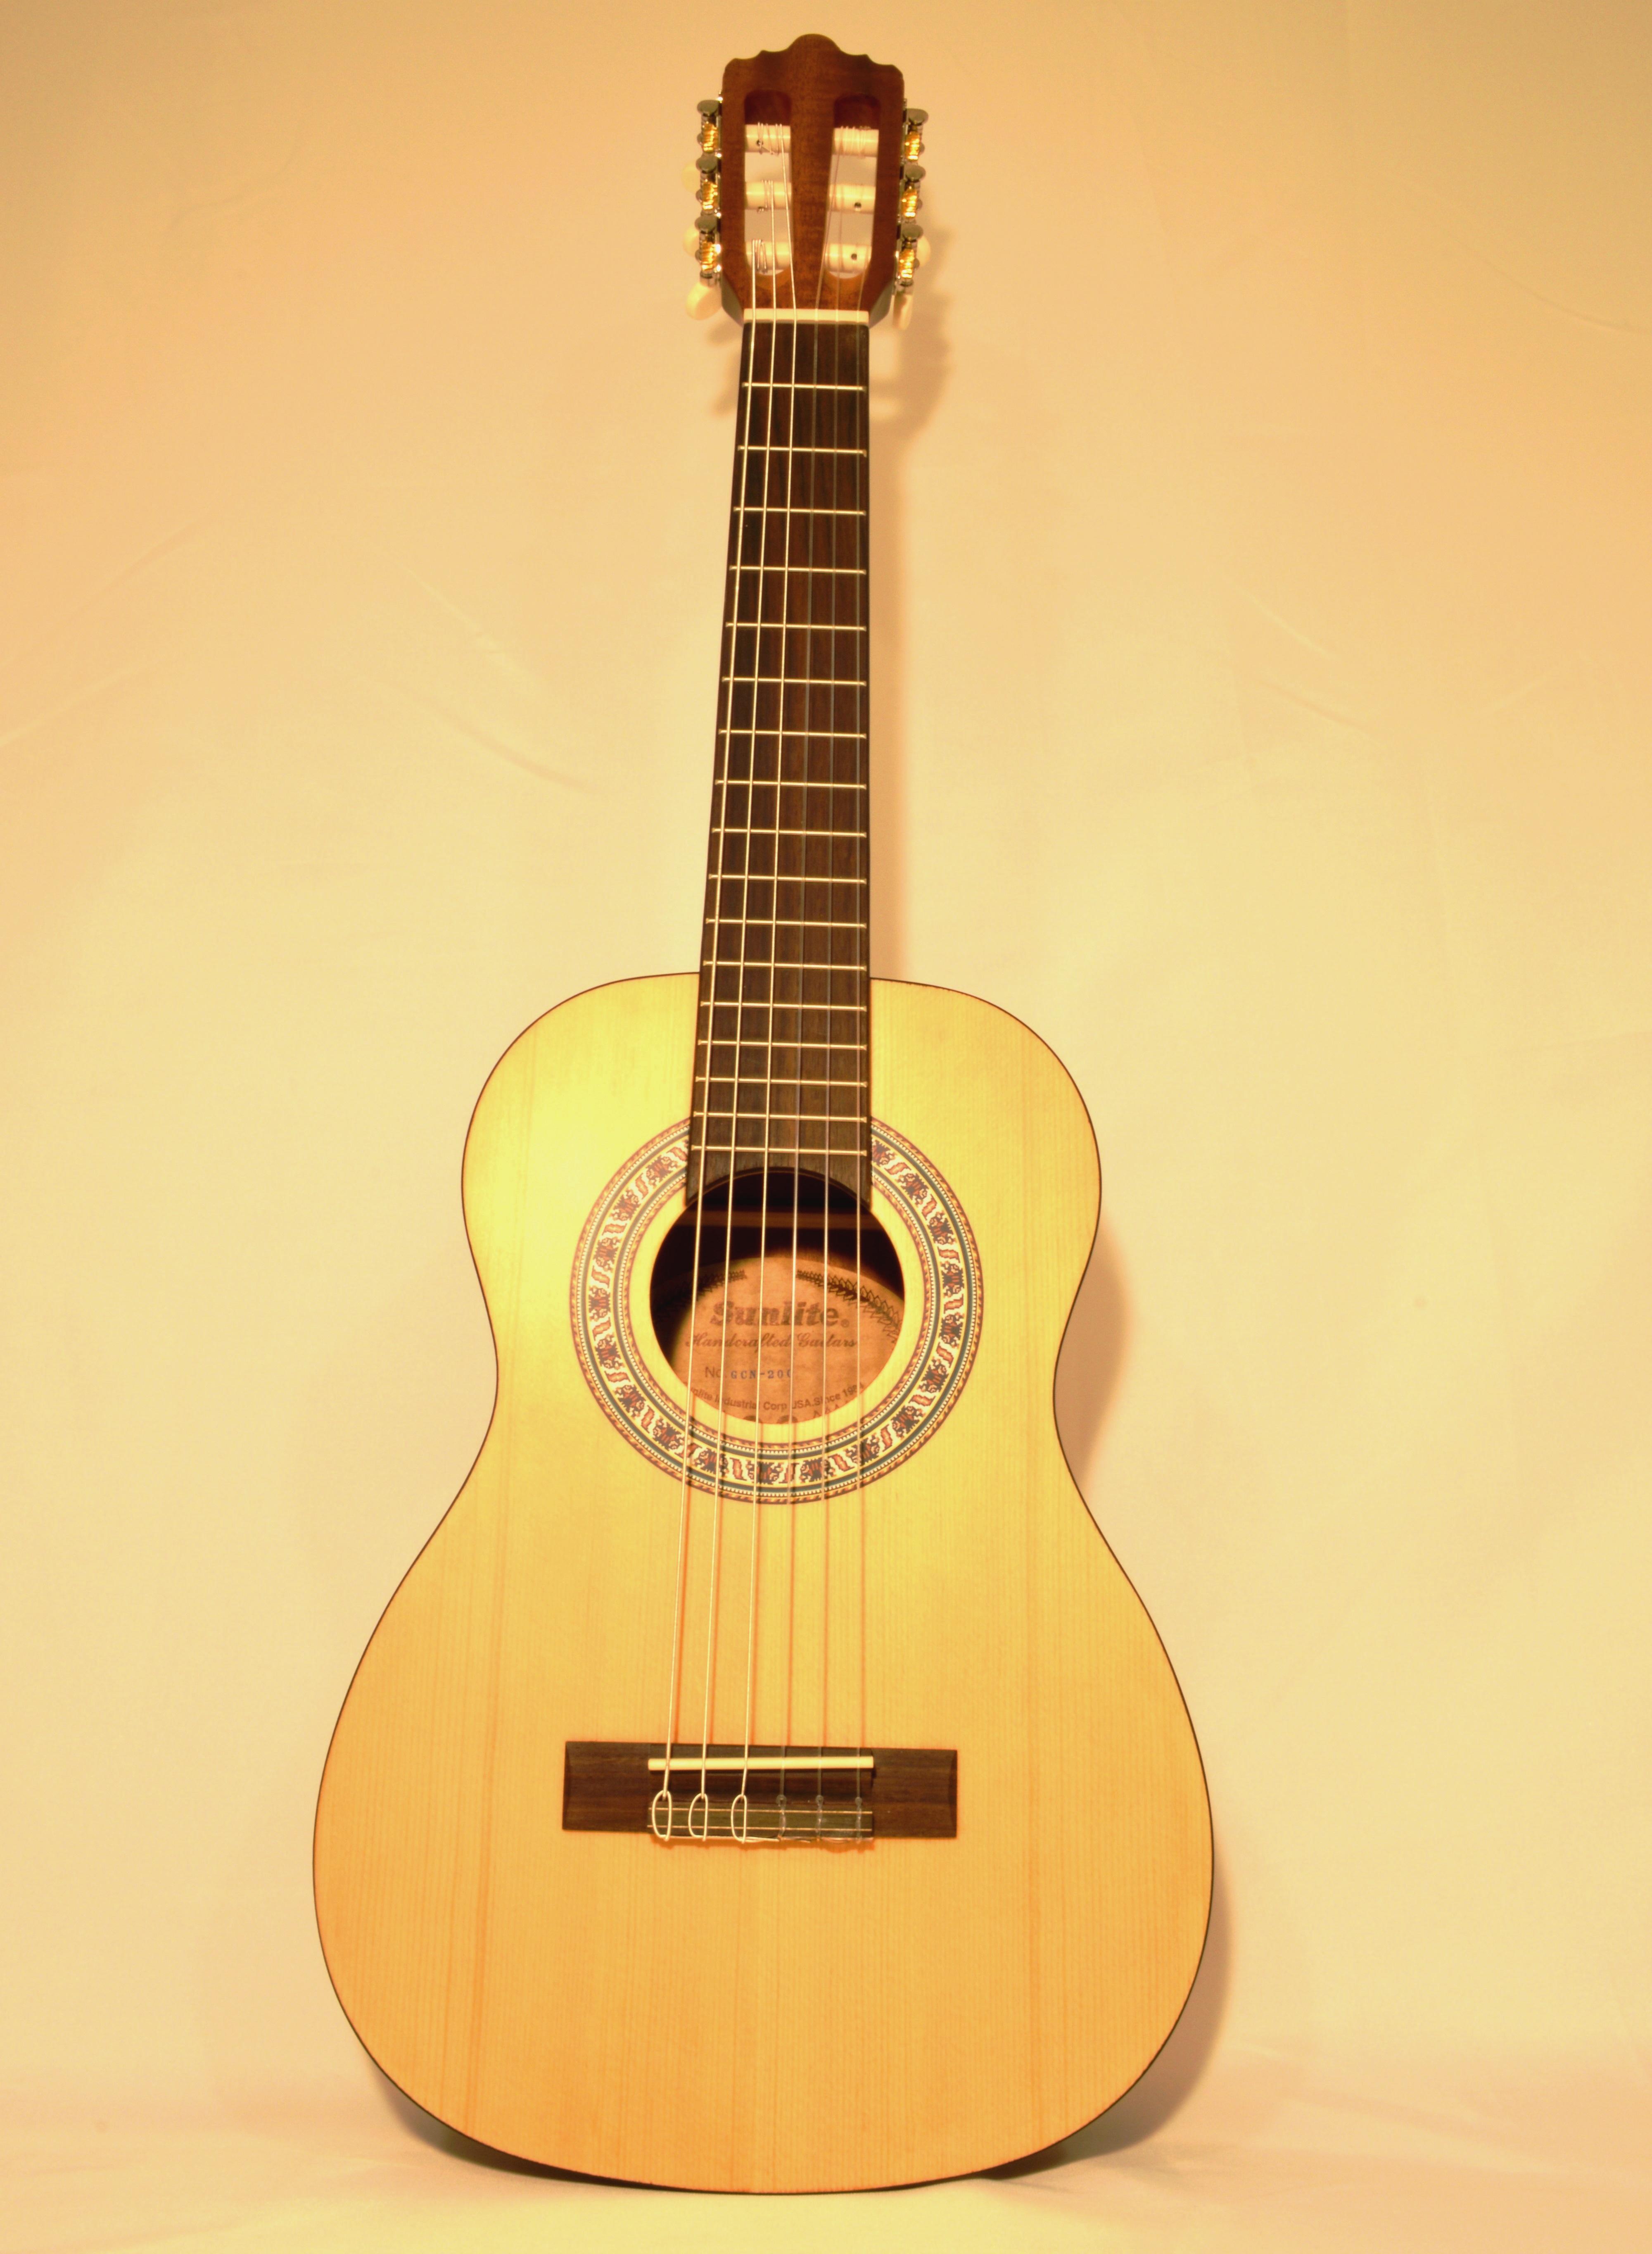 beginner acoustic guitar sunlite gcn 200 san marino music center. Black Bedroom Furniture Sets. Home Design Ideas